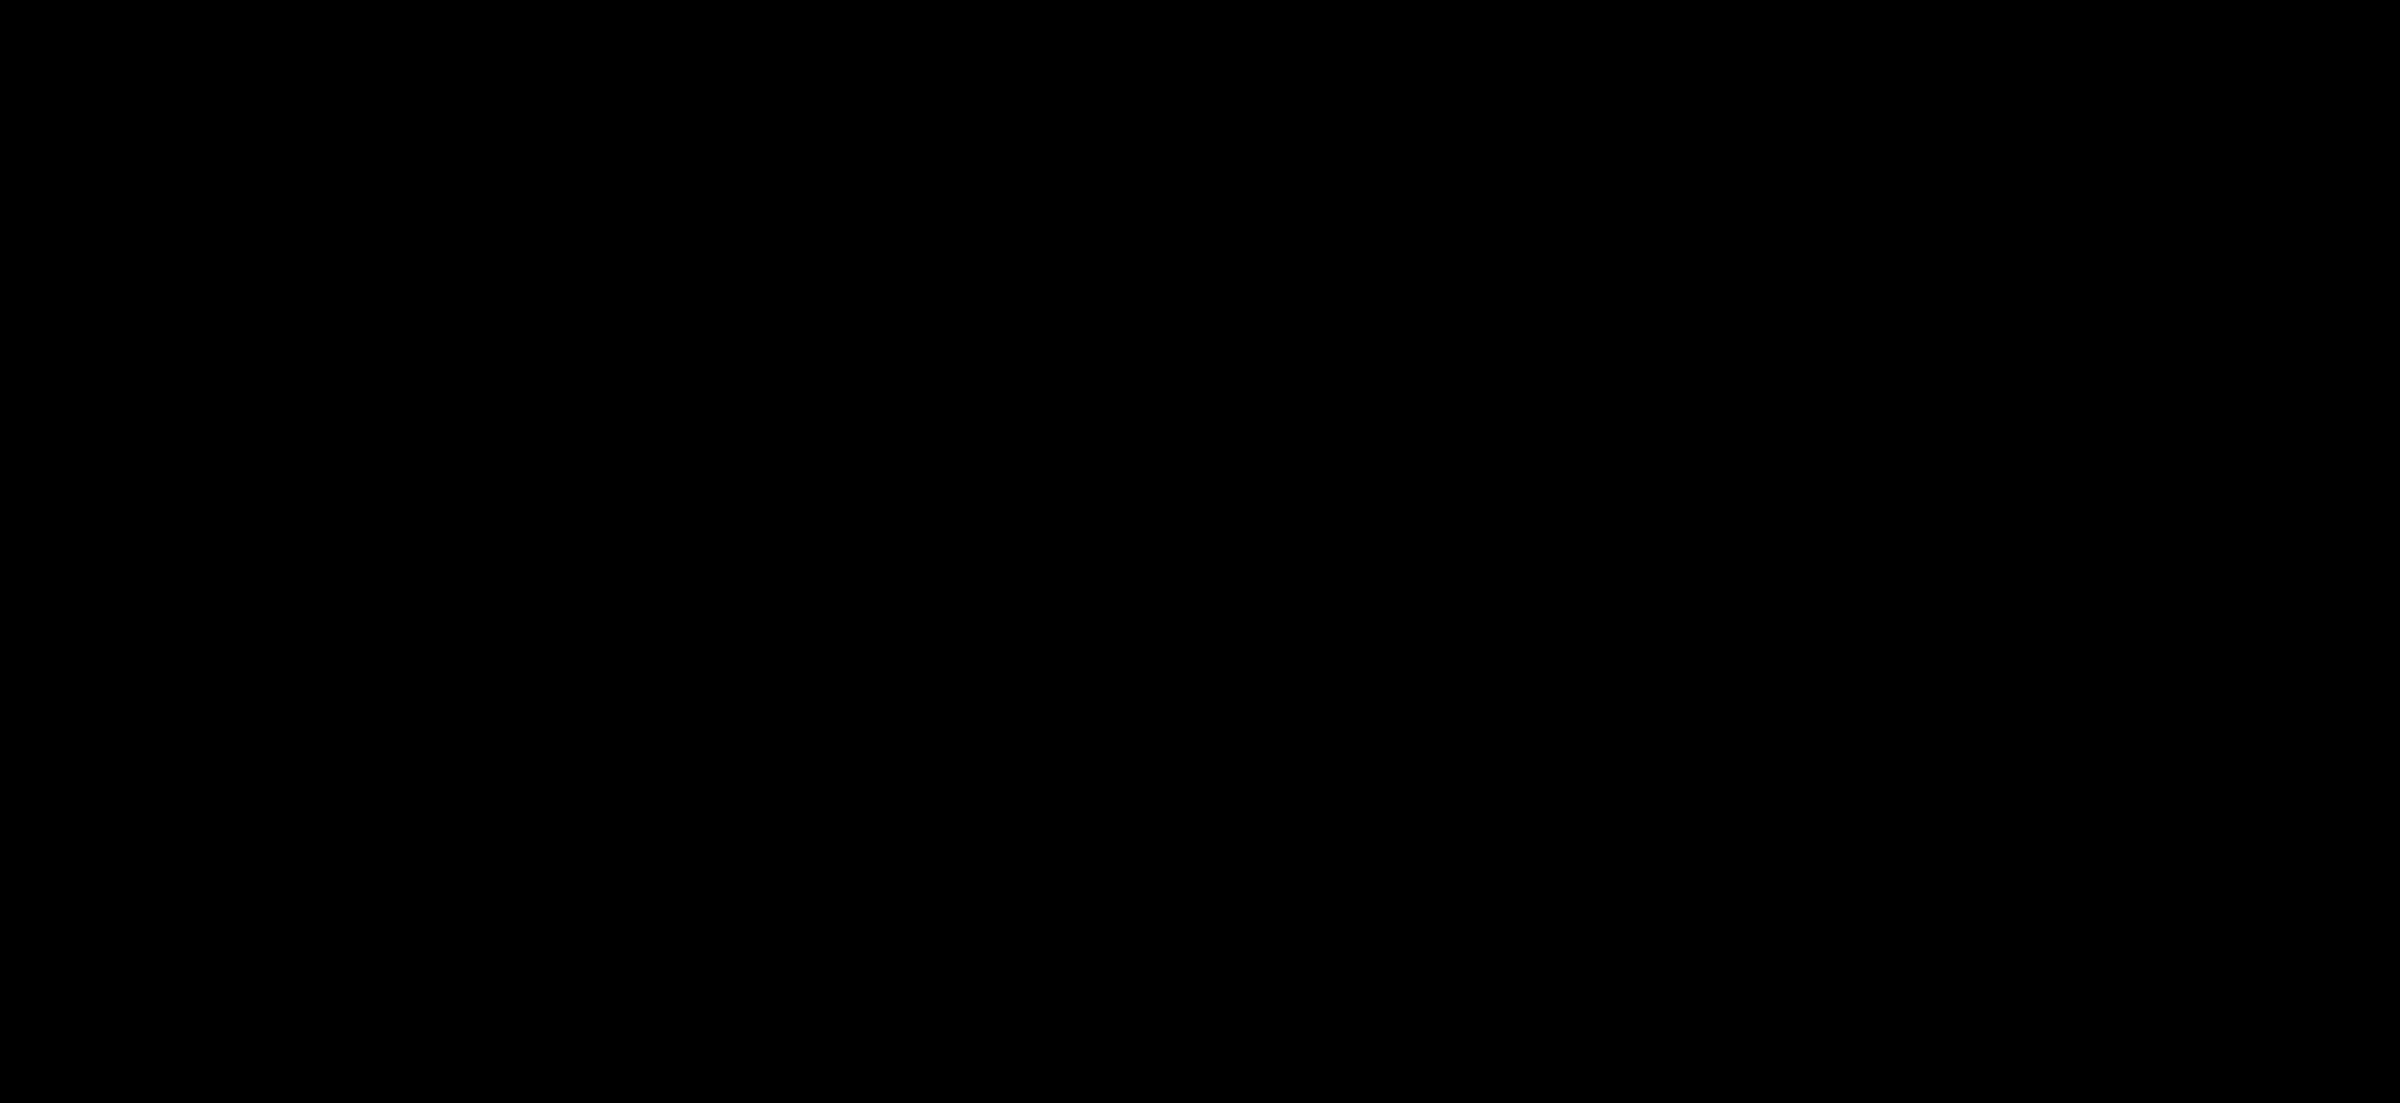 Glitch clipart silhouette (PNG) IMAGE Ilmenskie BIG 1